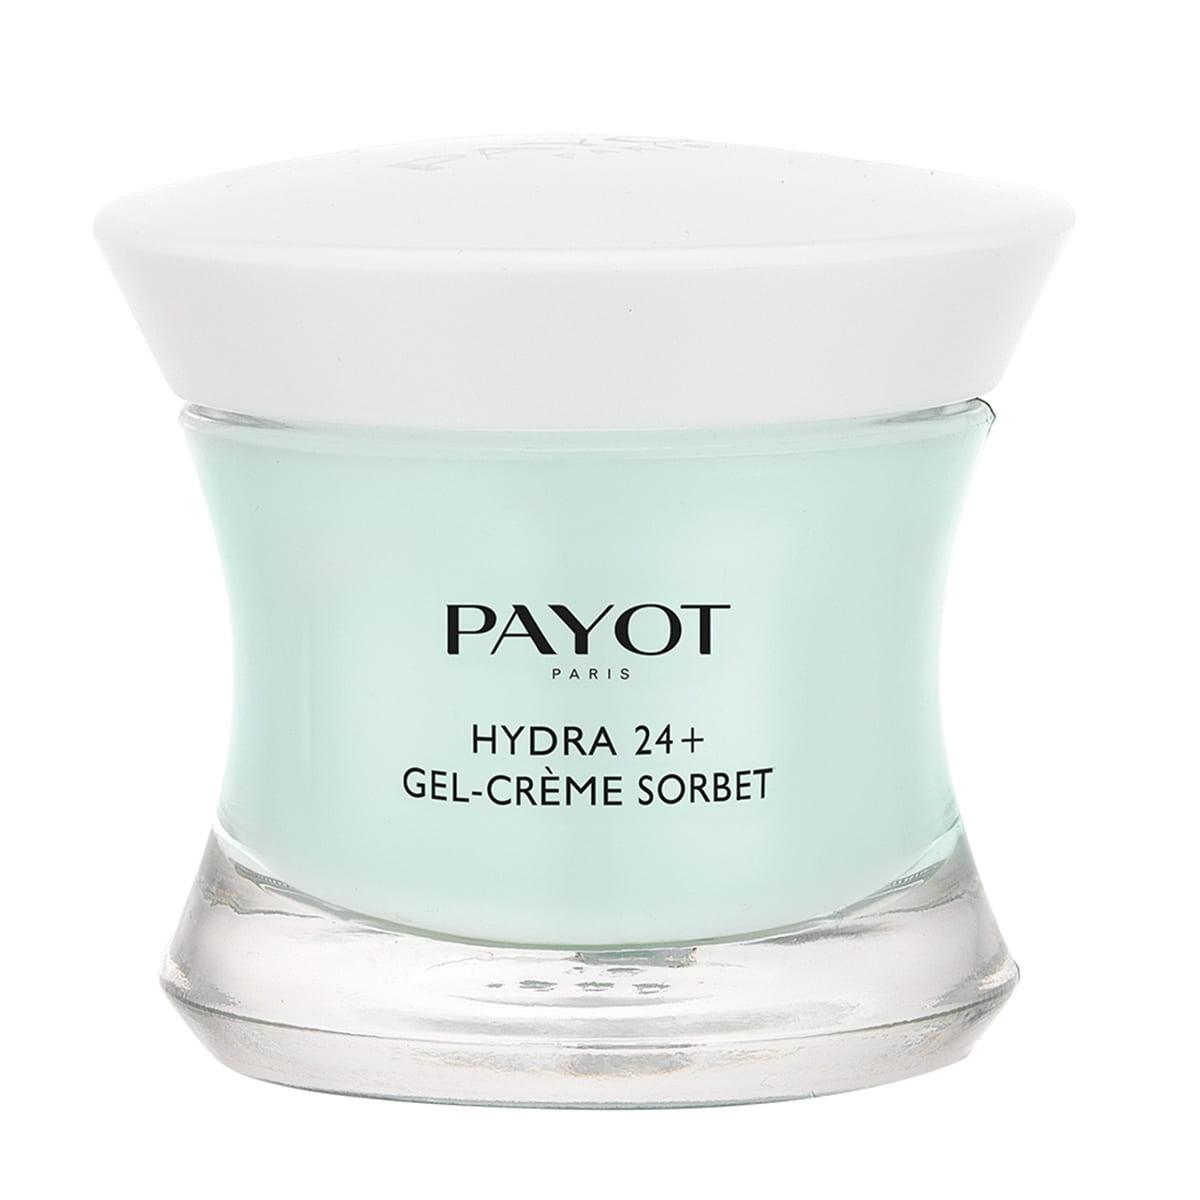 Payot - Hydra 24 + Gel-Crème Sorbet - Soin hydratant repulpant